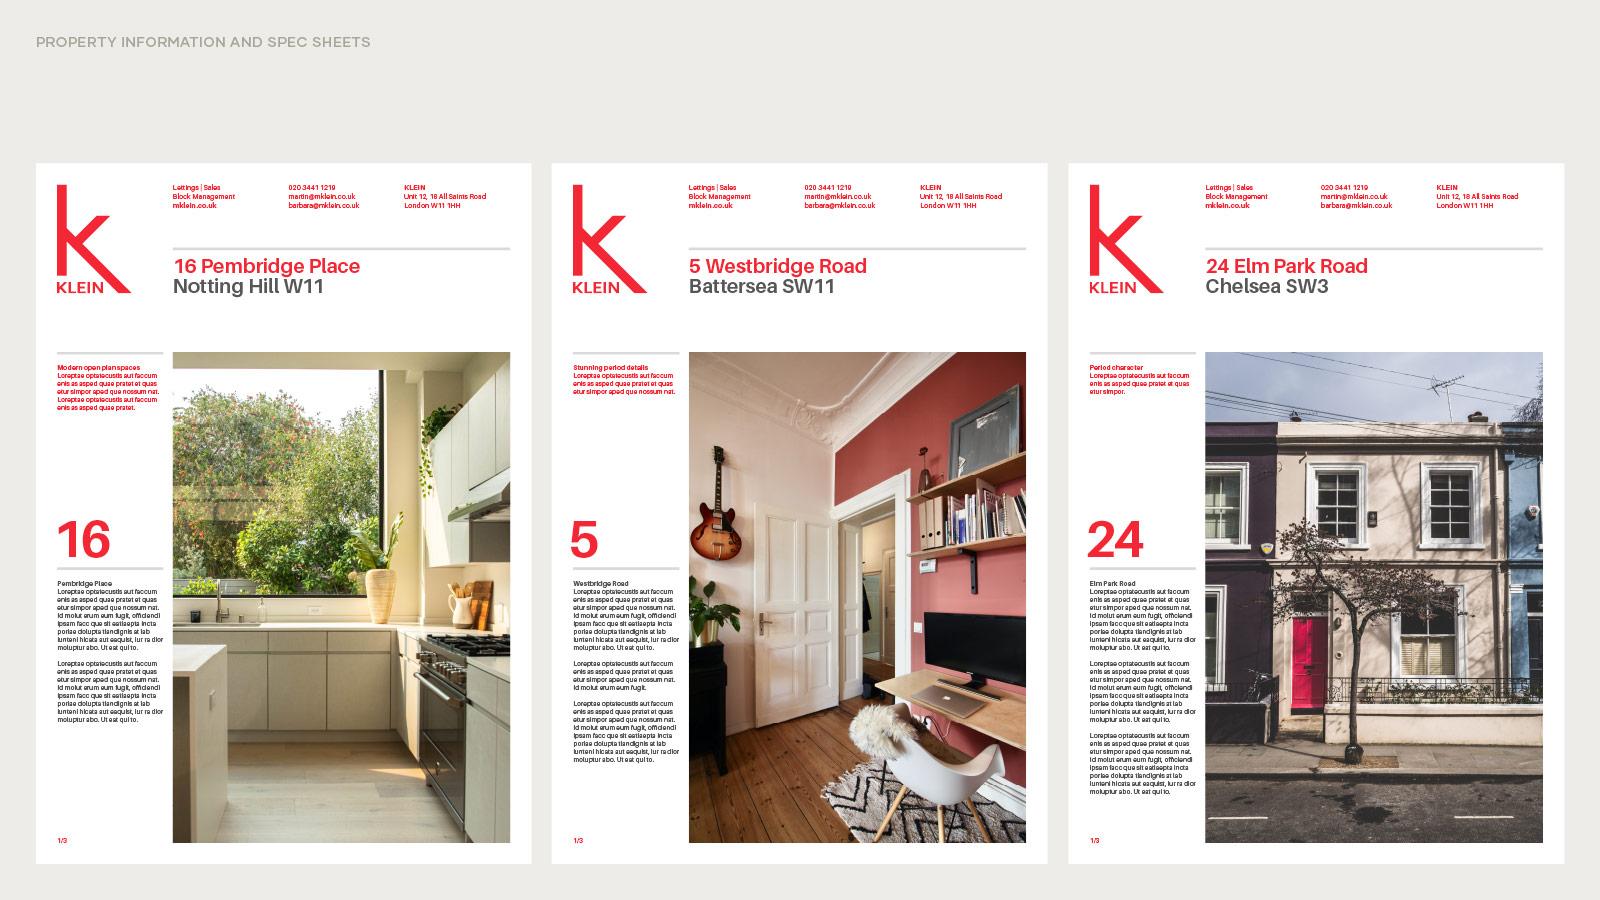 property-agency-visual-branding-identity-design-milton-keynes-london-7